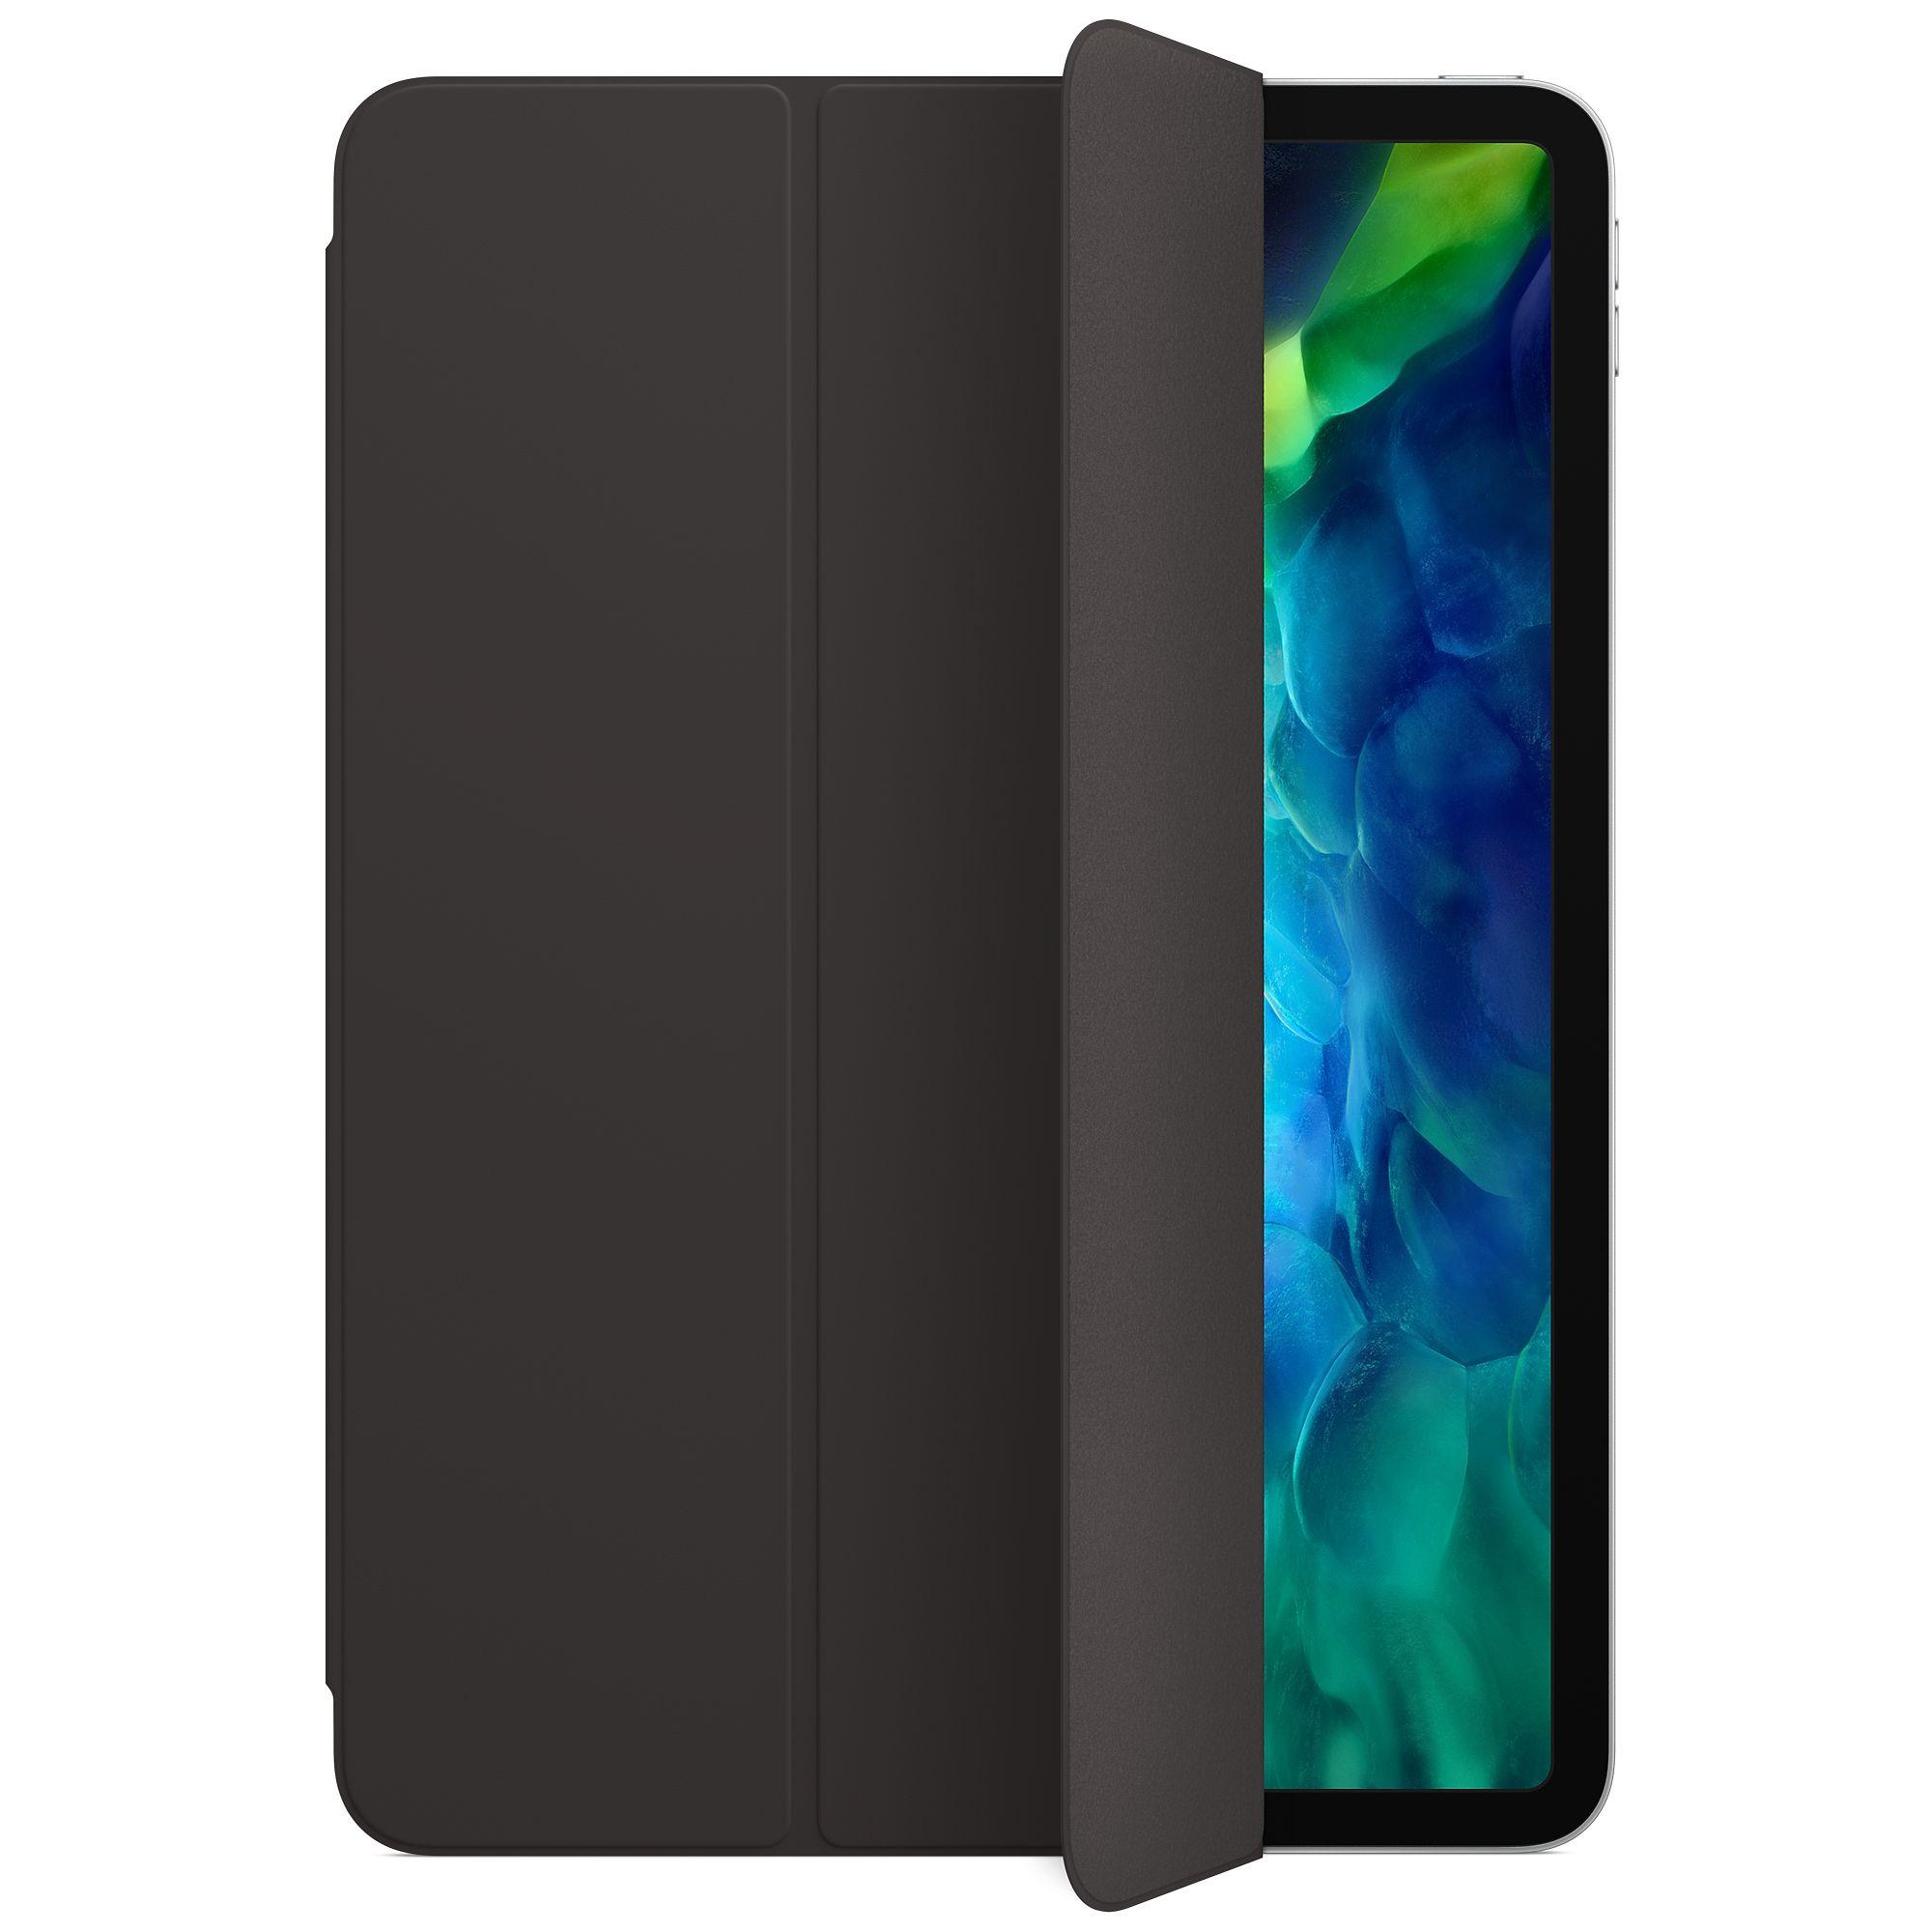 "Чехол Apple Smart Folio для iPad Pro 11"" Black MXT42"